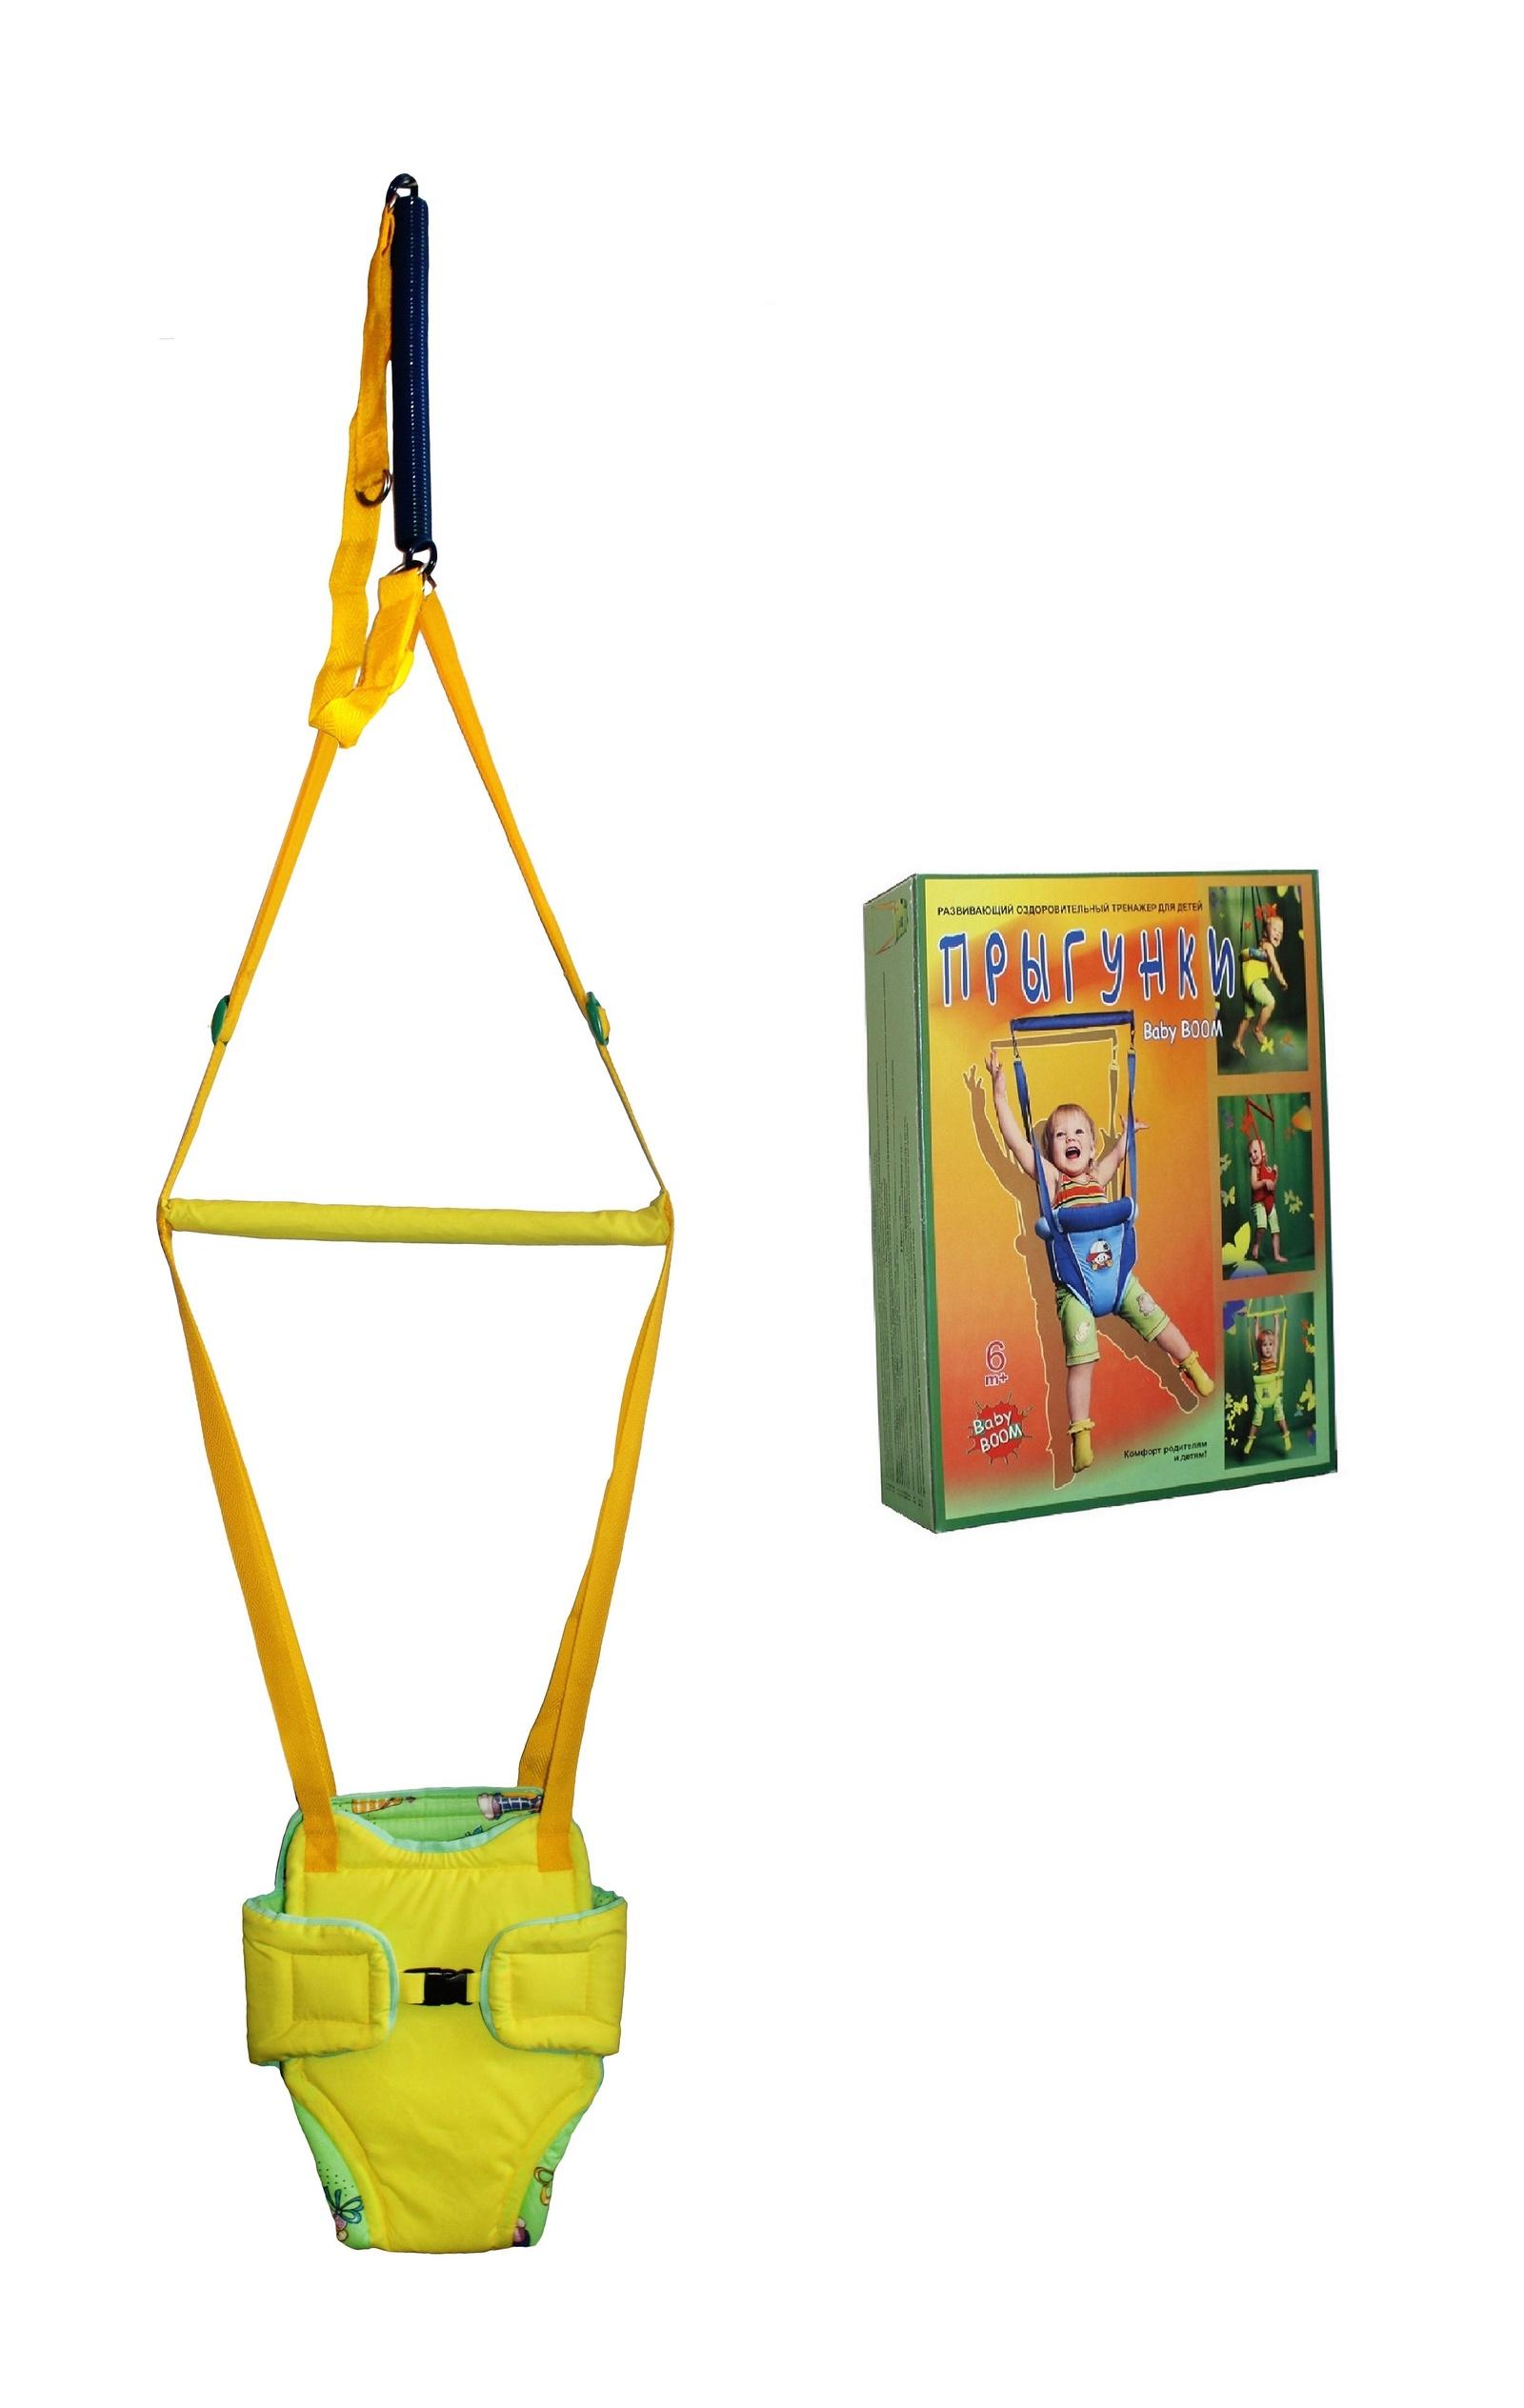 прыгунки Прыгунки Риббис 8_яр.желт_св.зел_желт желтый, светло-зеленый